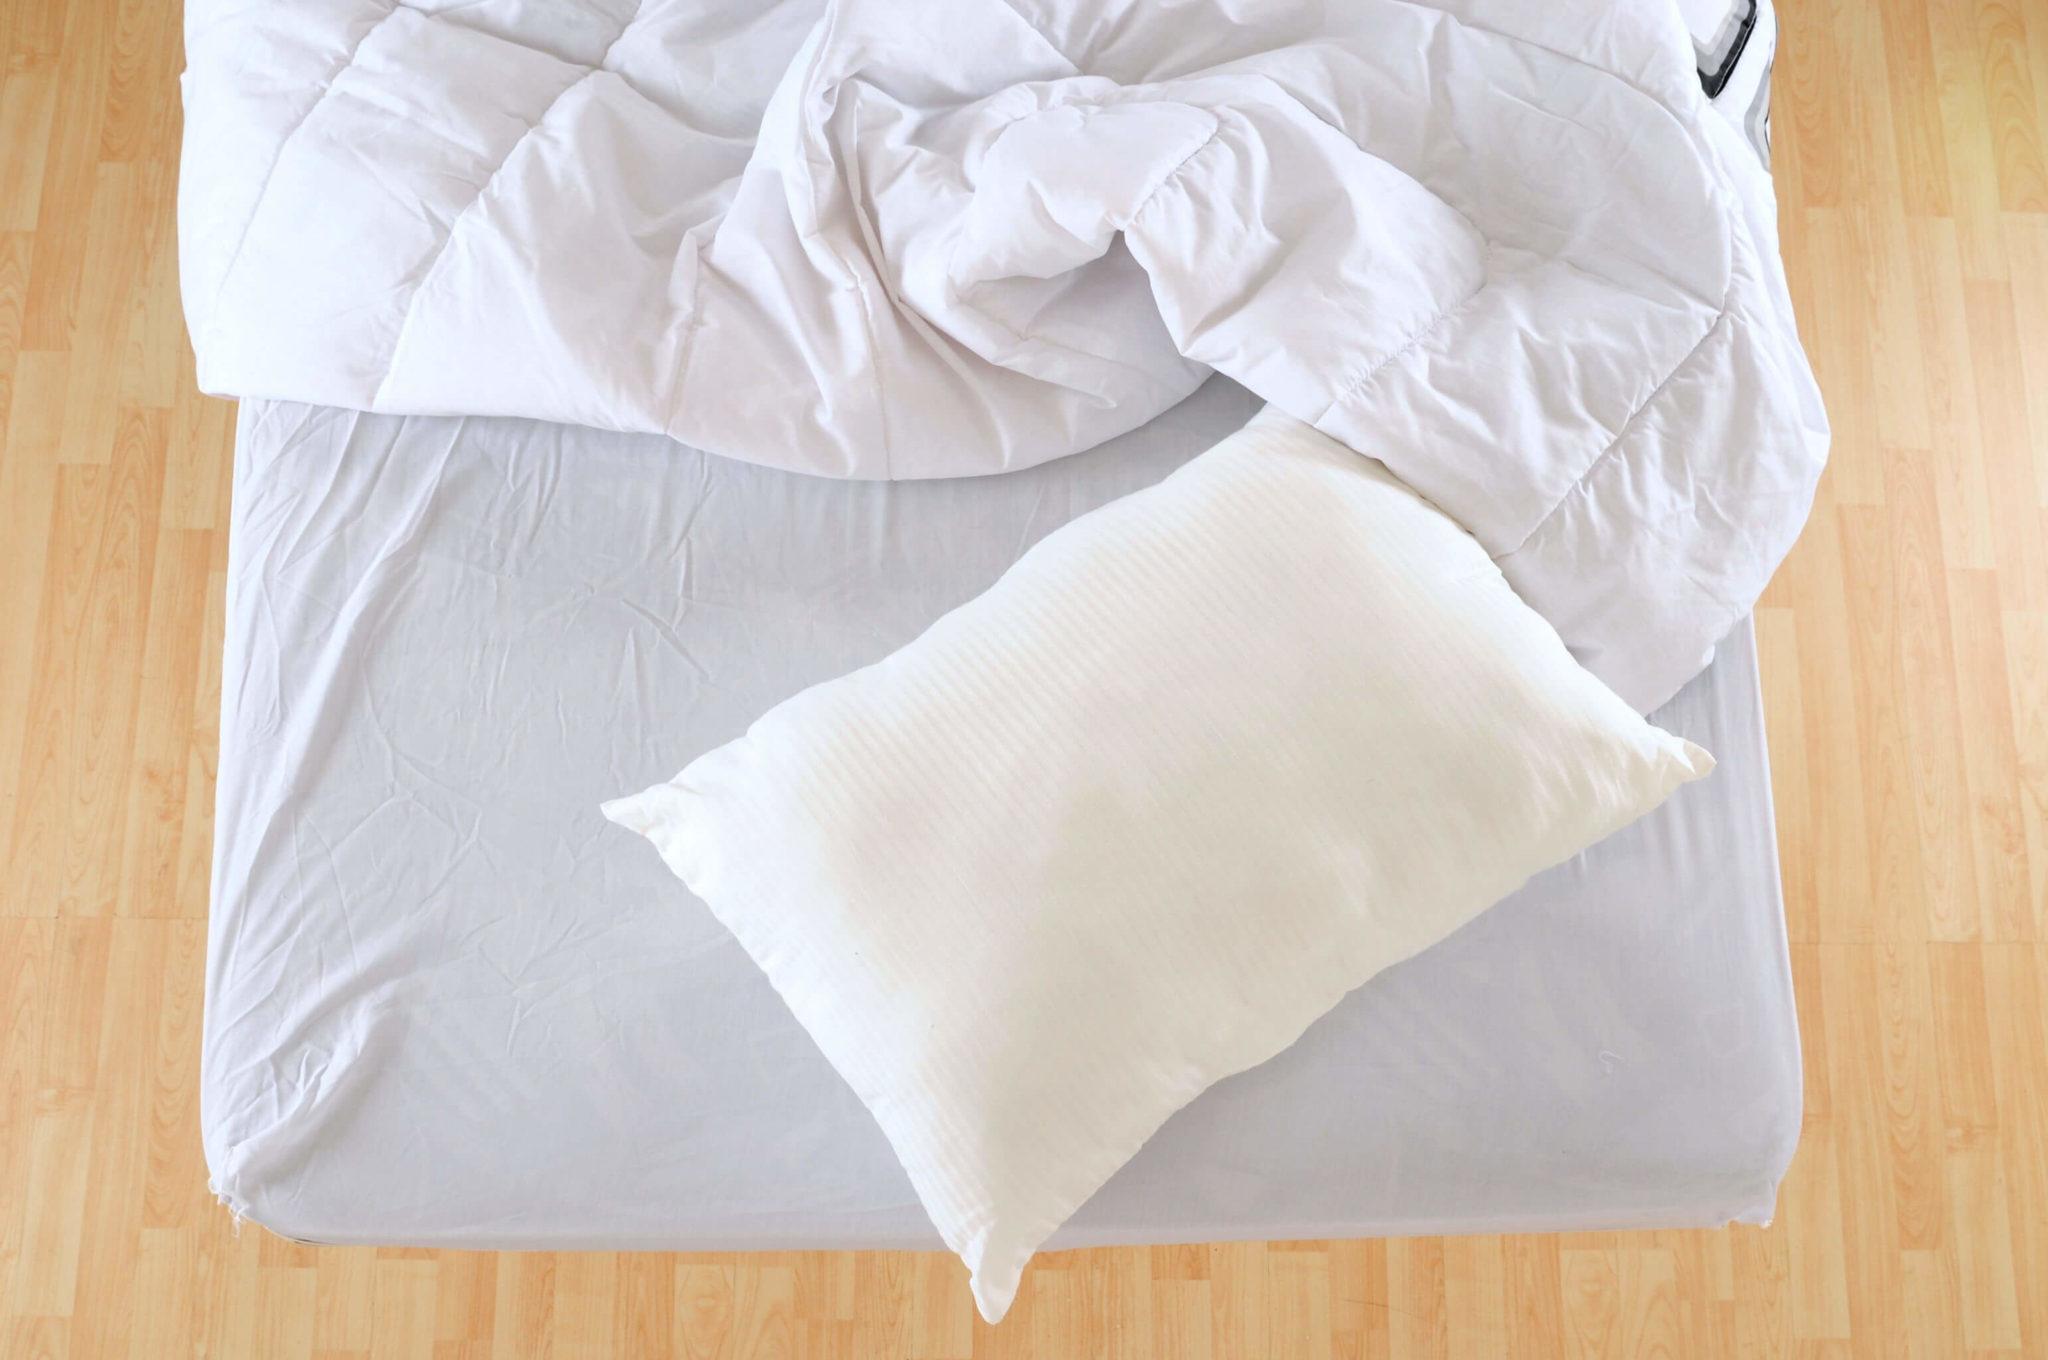 mattress-white-bedding-how-to-shop-for-a-new-mattress